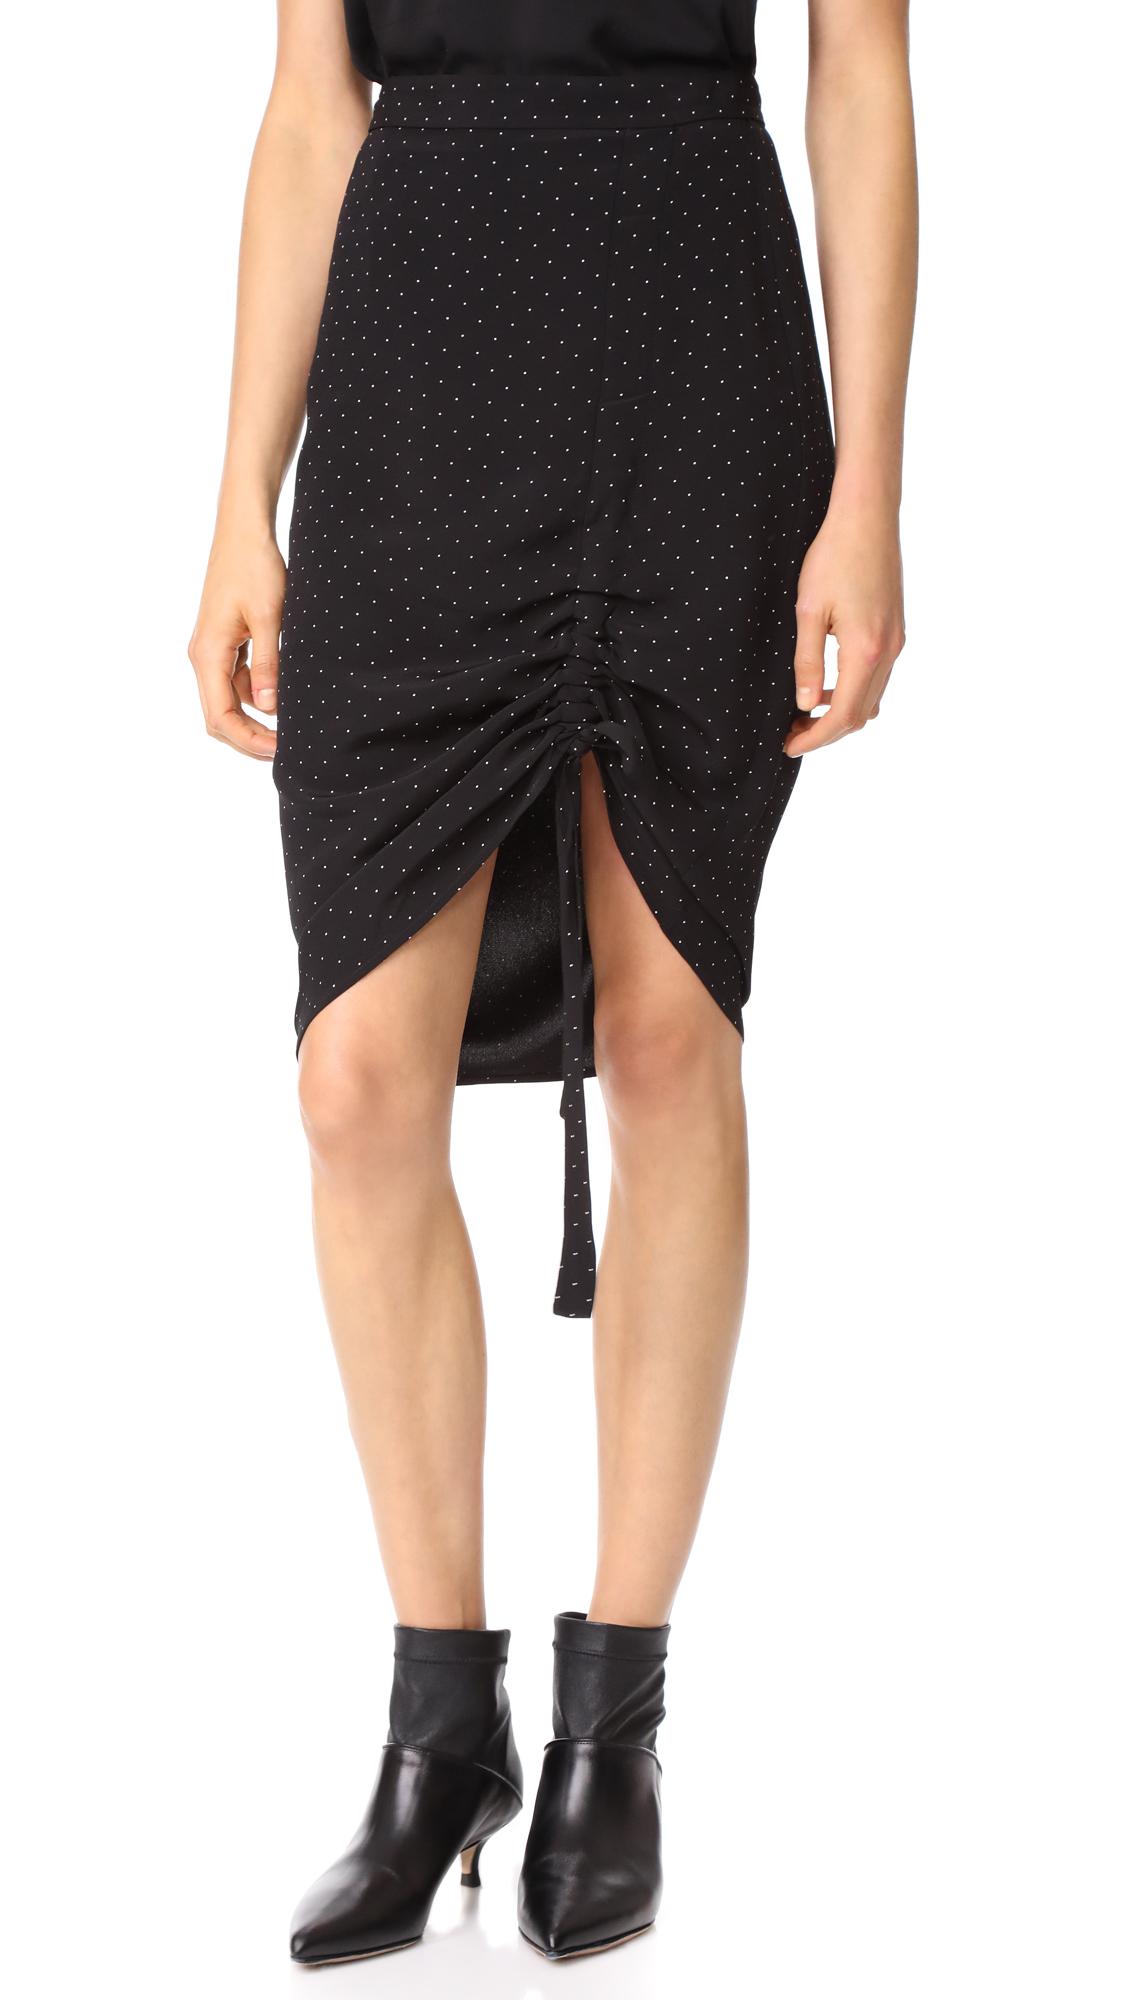 Alexis Ivy Skirt - Black Micro Dot